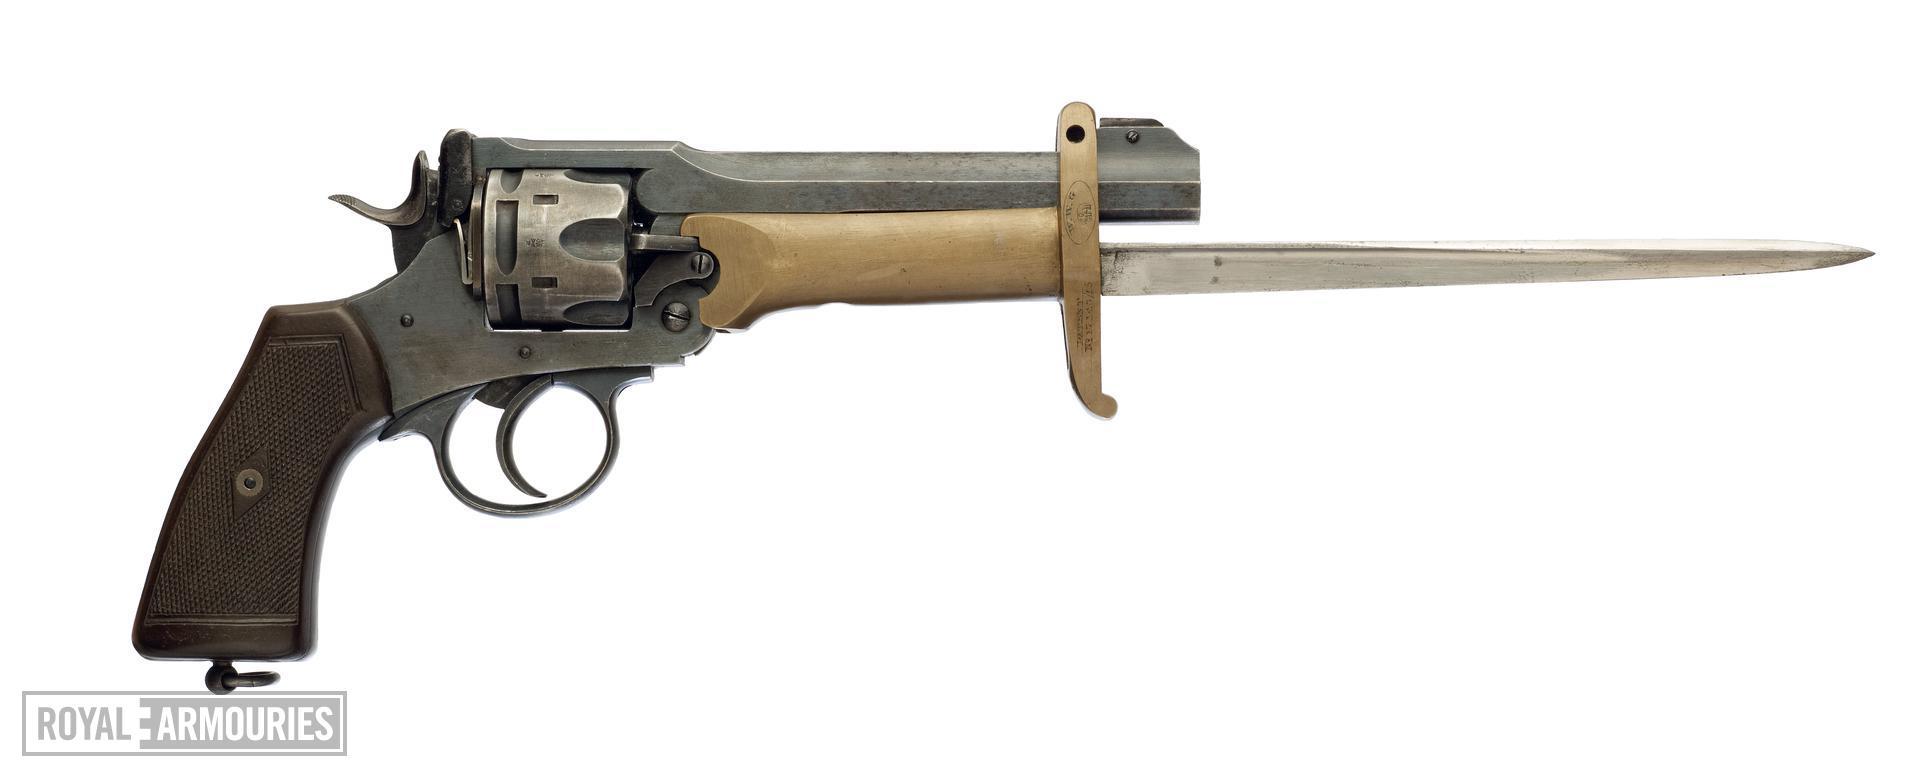 Centrefire six-shot revolver - Webley Mark VI  revolver (with Pritchard-Greener bayonet)